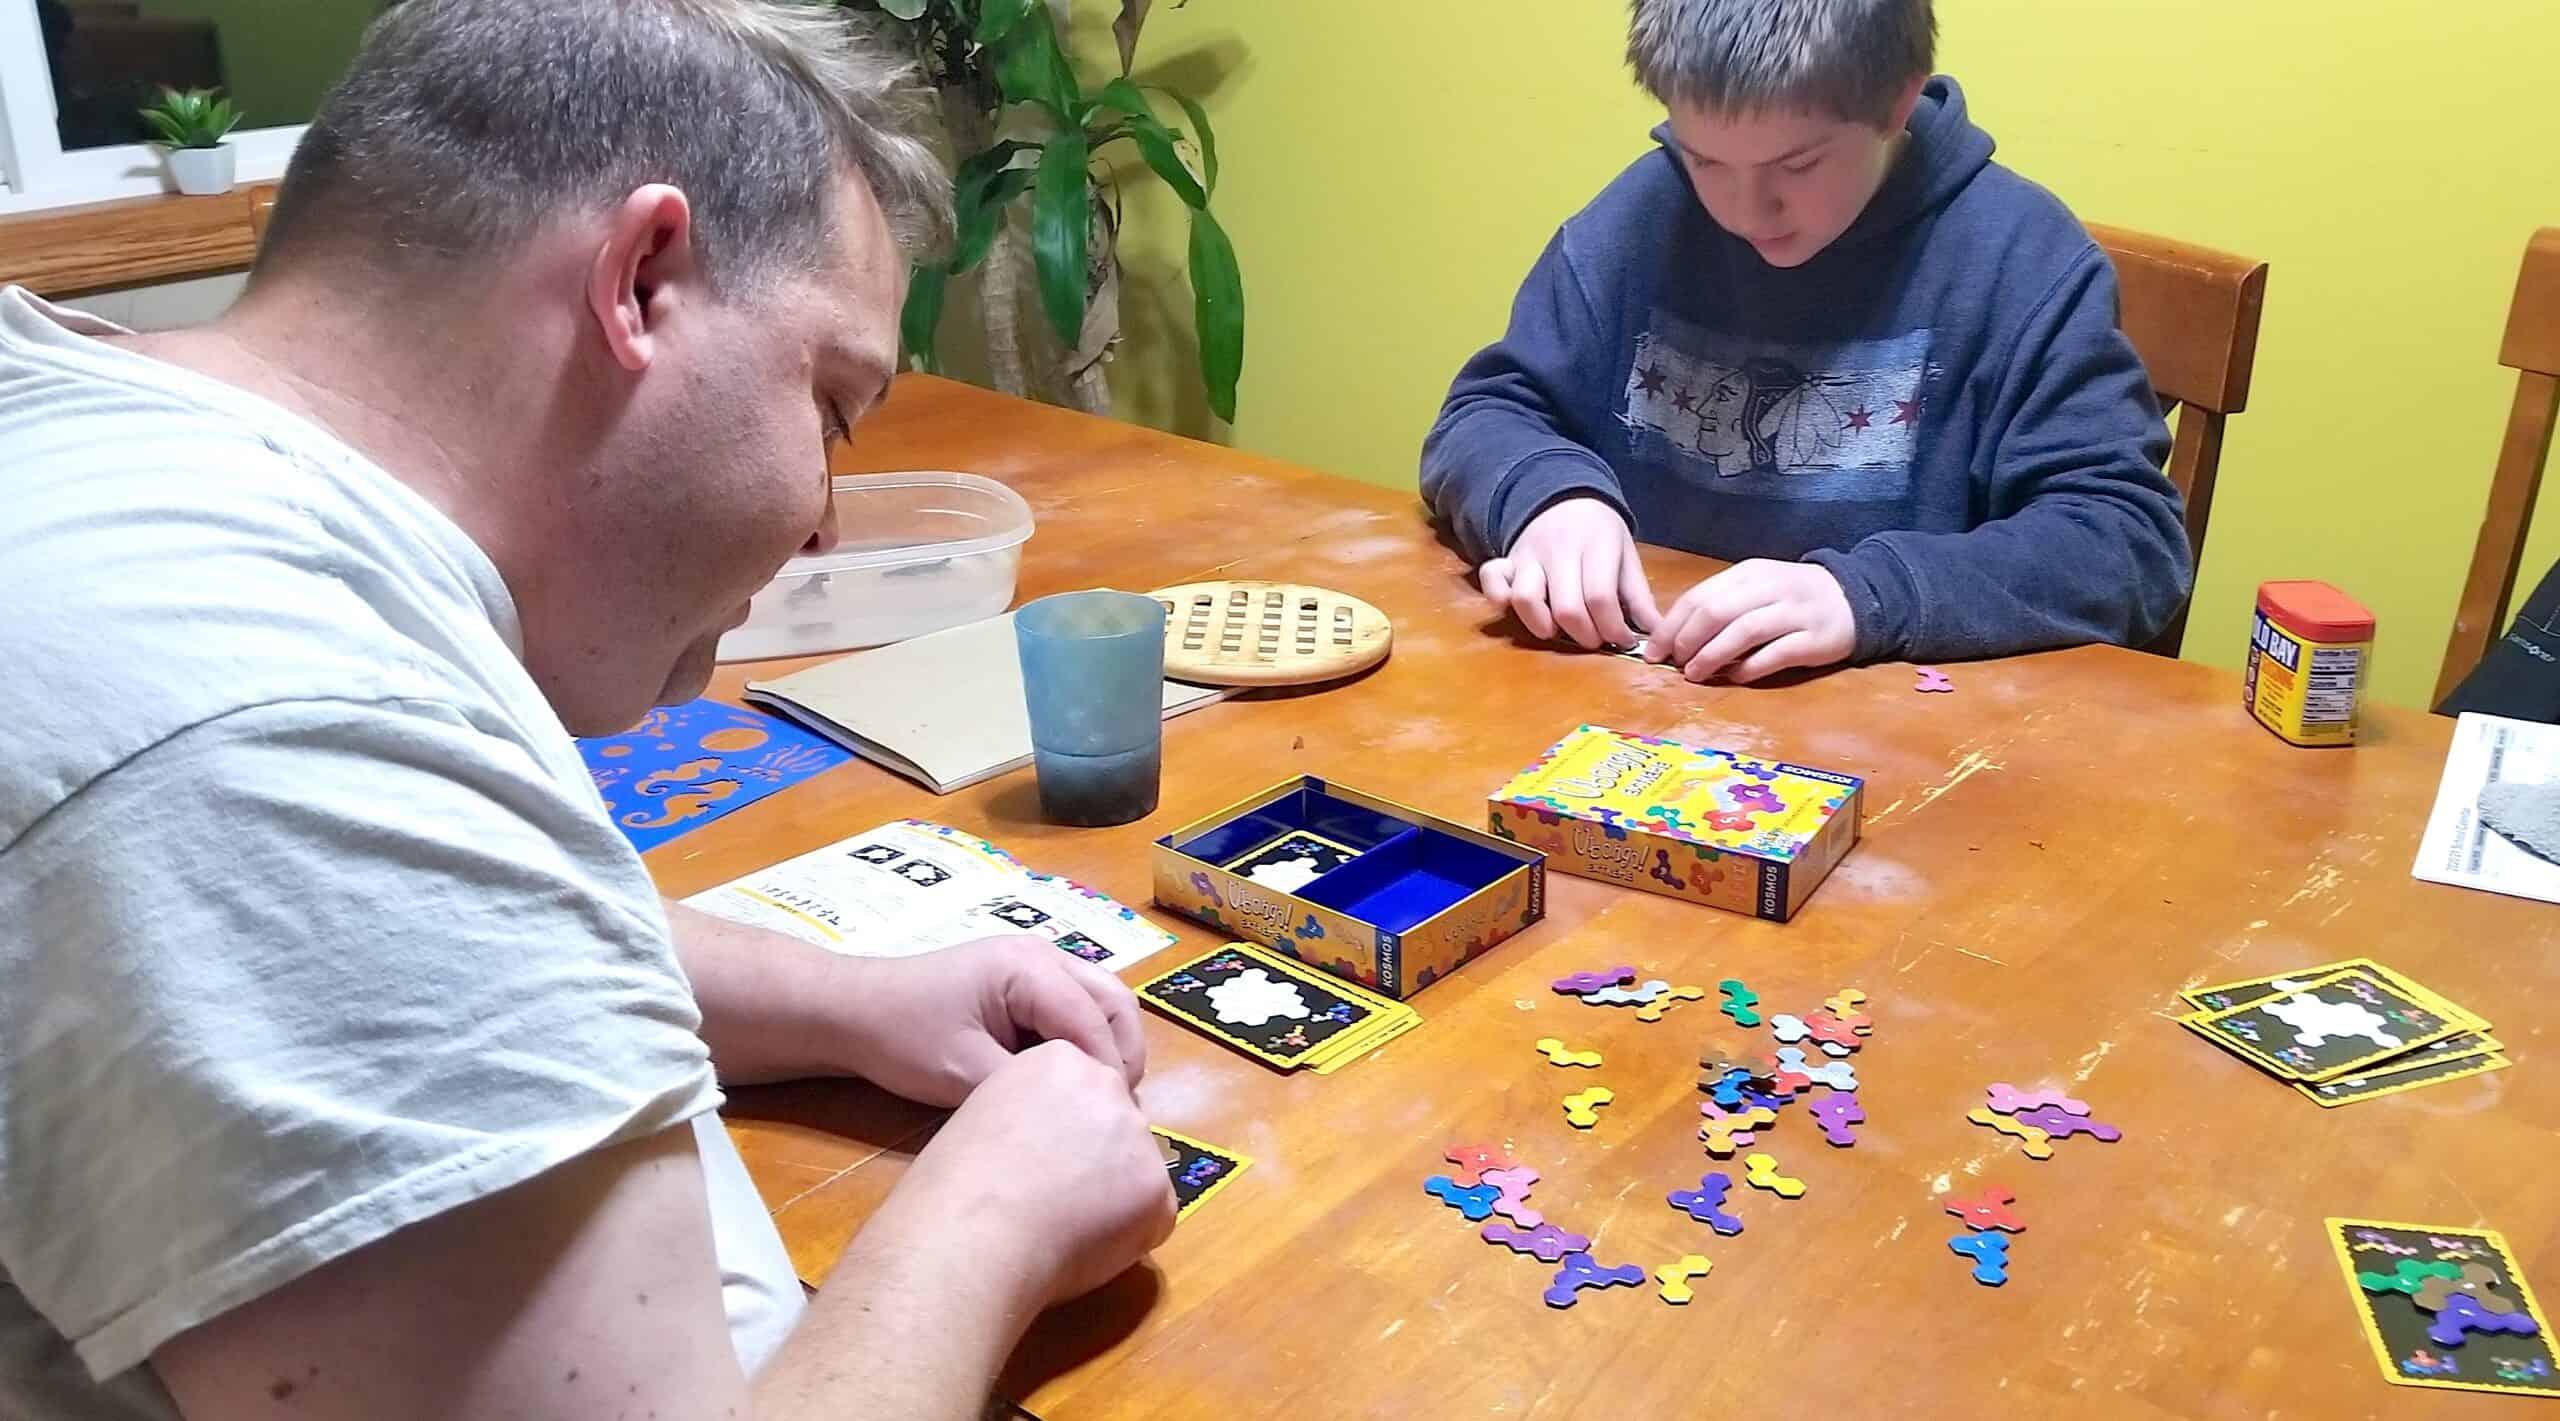 dad and teen playing math game Ubongo Extreme